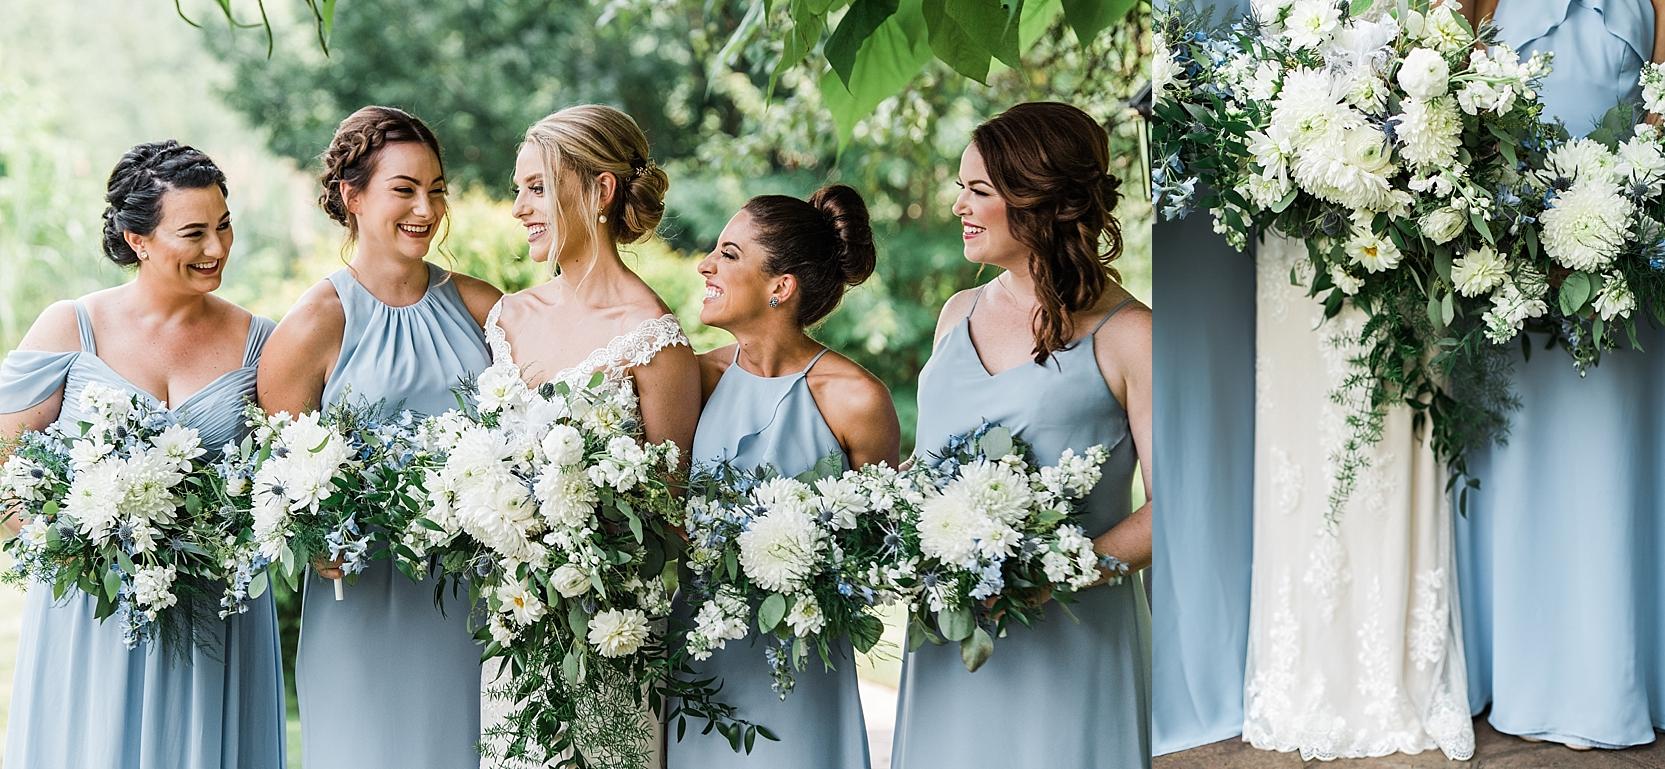 Welshfield-Inn-Wedding-Cleveland-Wedding-Photographer-Lindsey-Ramdin-78.jpg